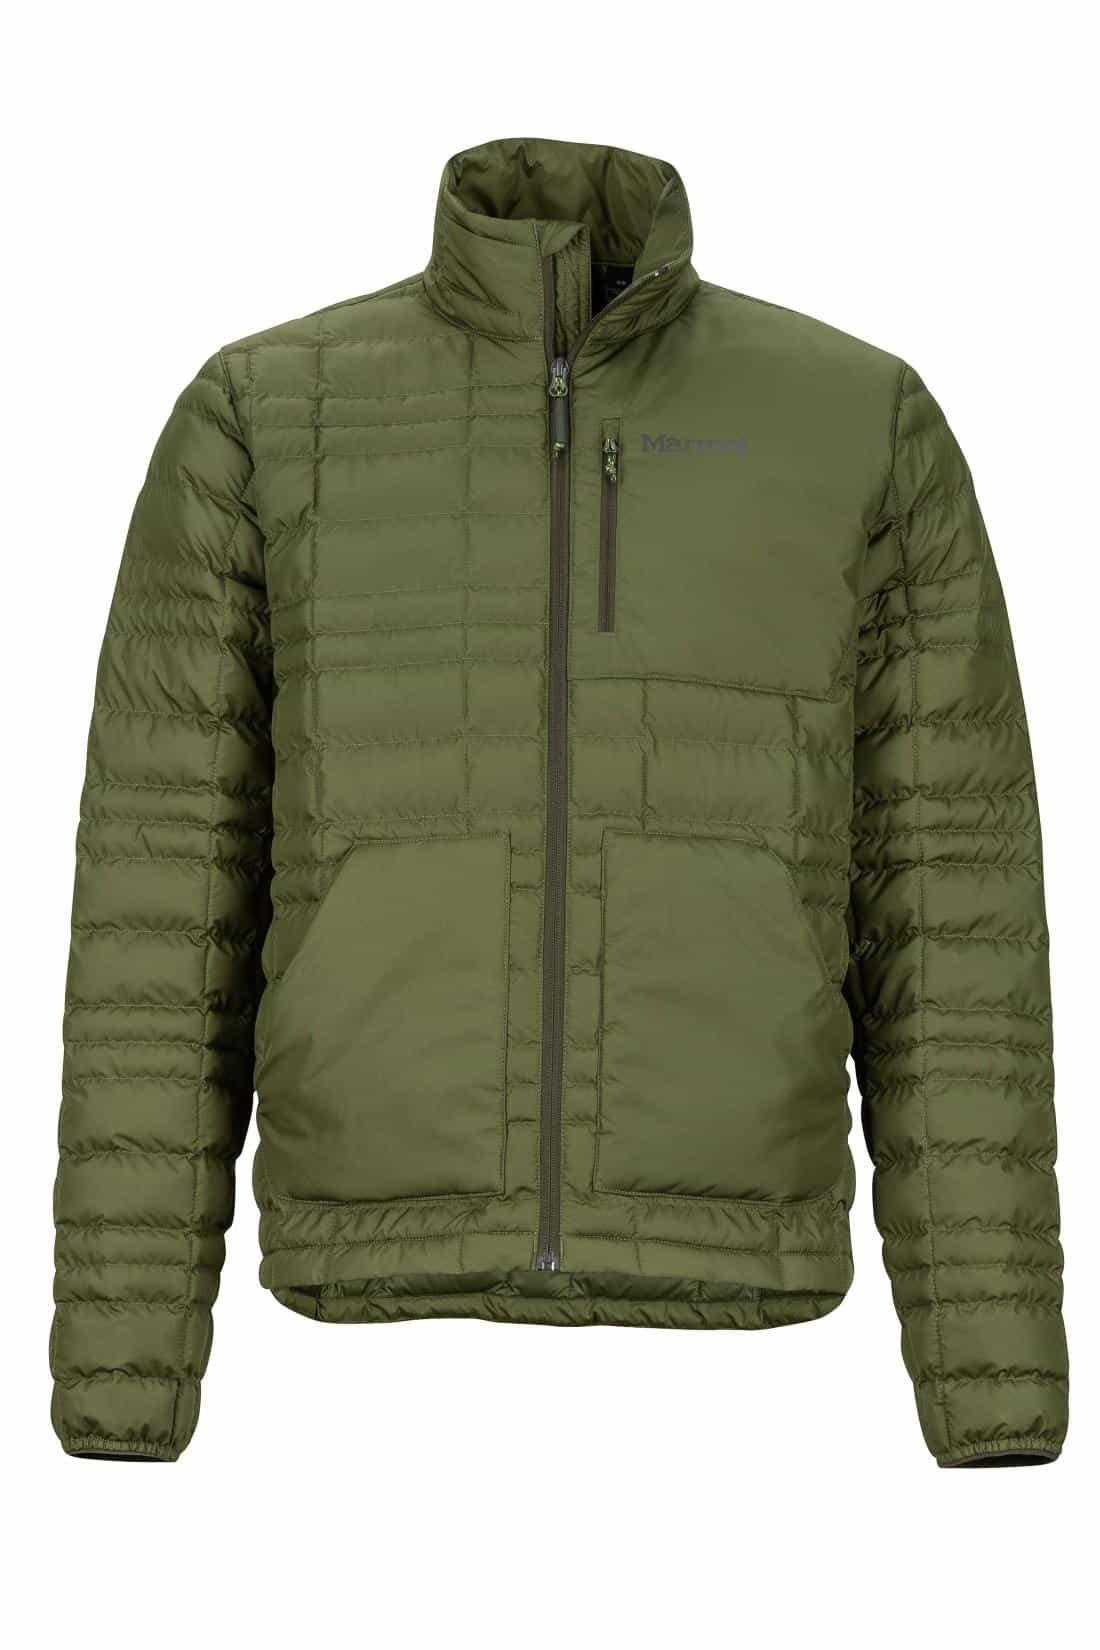 Marmot-Istari Jacket - Men's